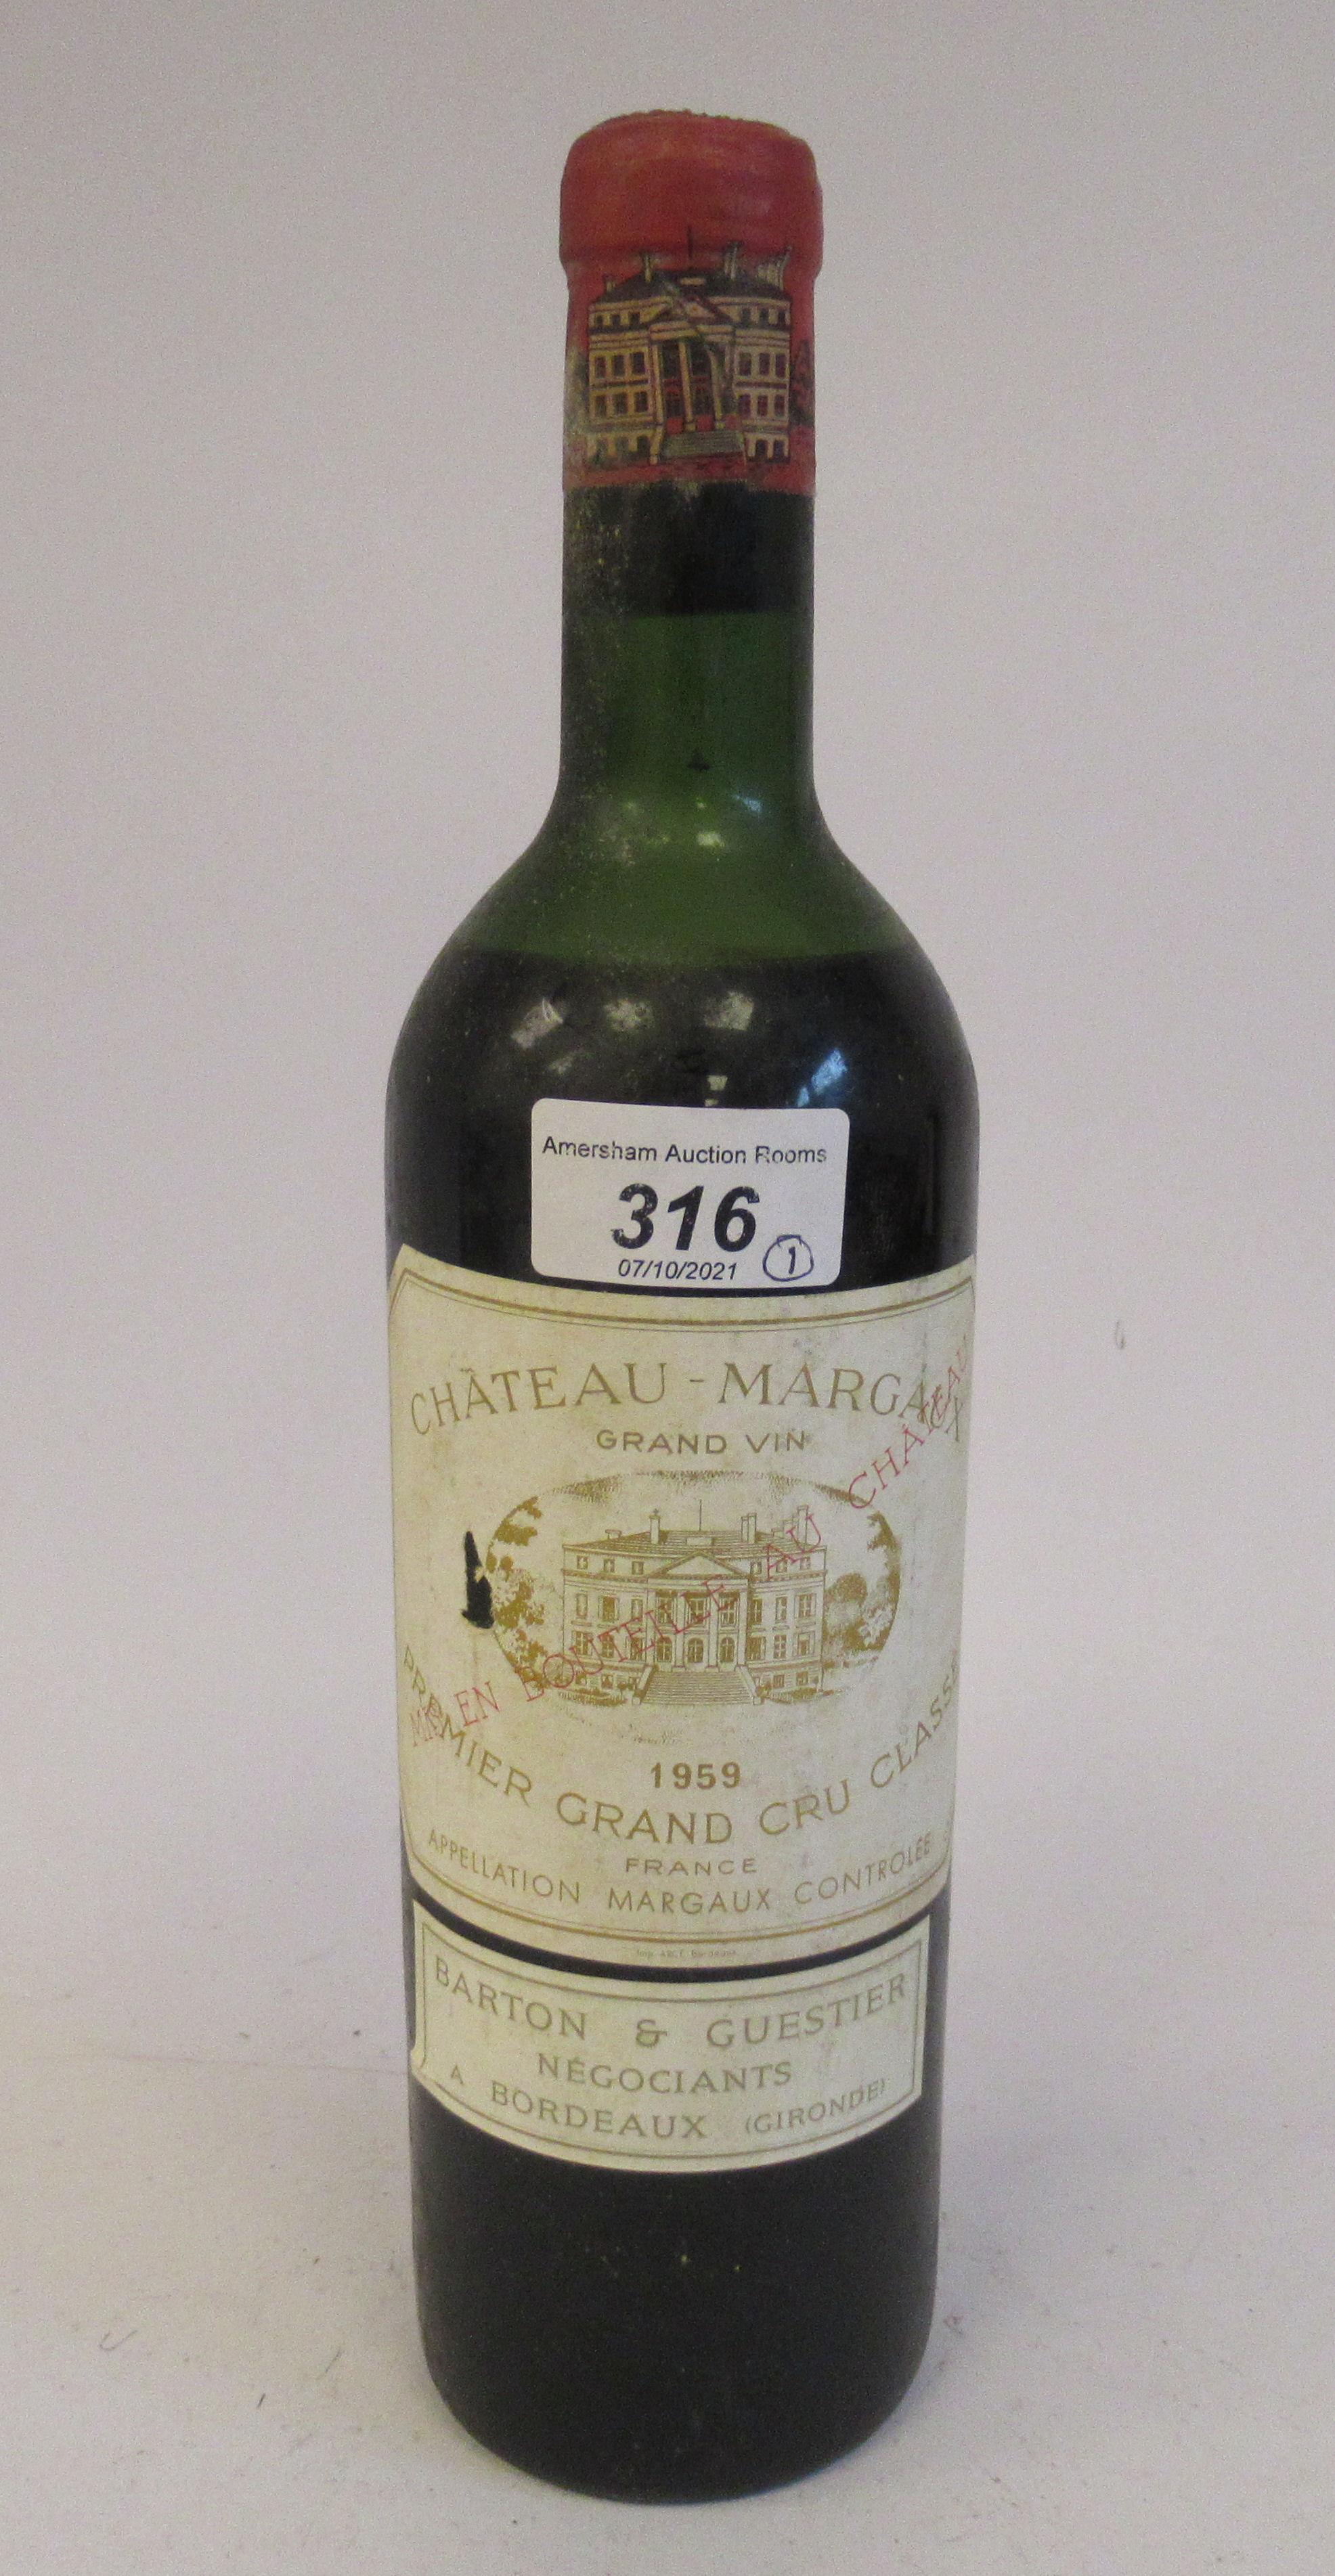 Wine, a bottle of 1959 Chateau Margaux Premier Grand Cru